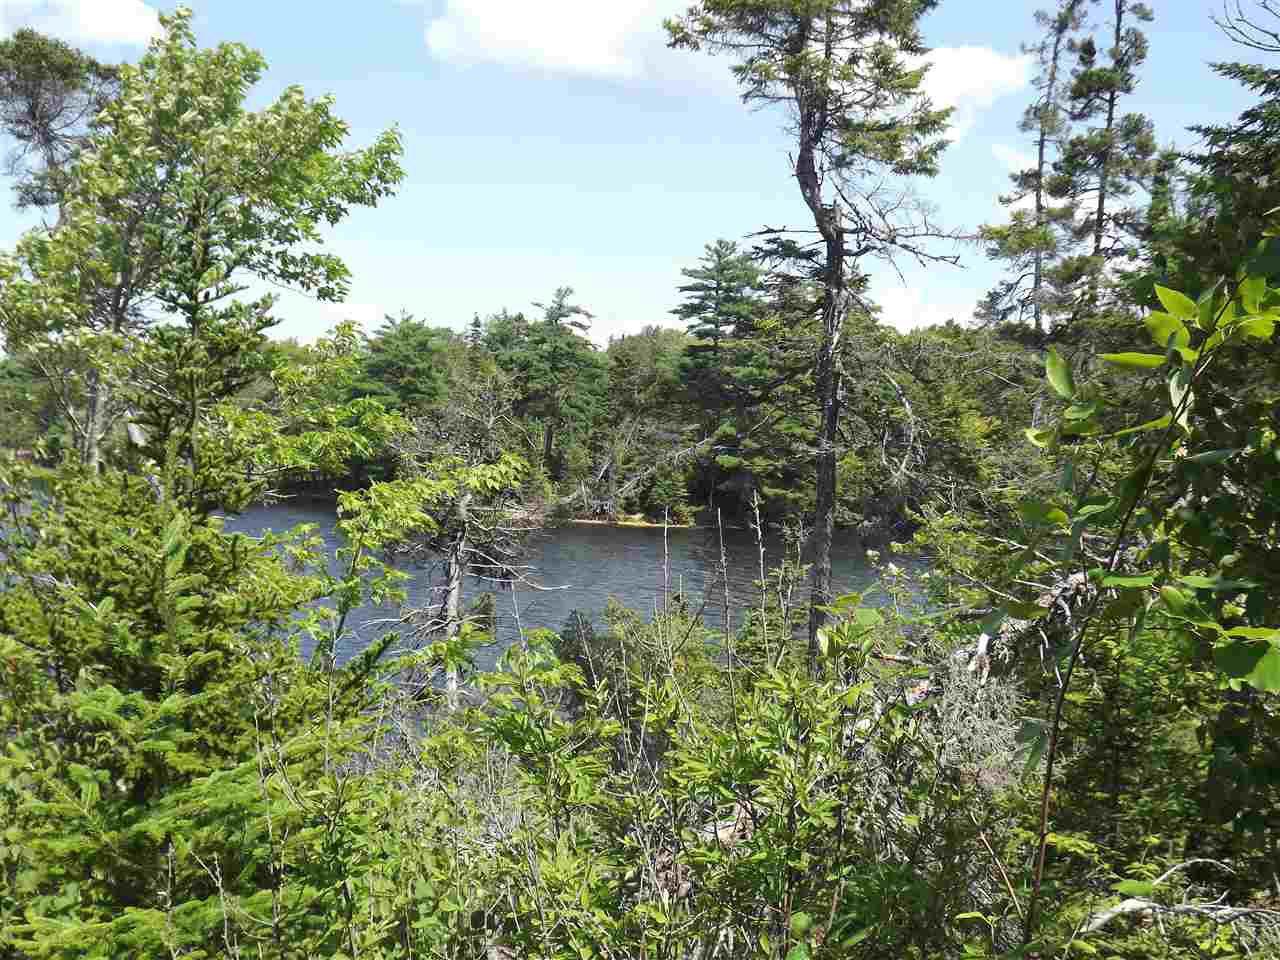 Photo 3: Photos: Trout Brook Road in Albert Bridge: 210-Marion Bridge Vacant Land for sale (Cape Breton)  : MLS®# 201919549